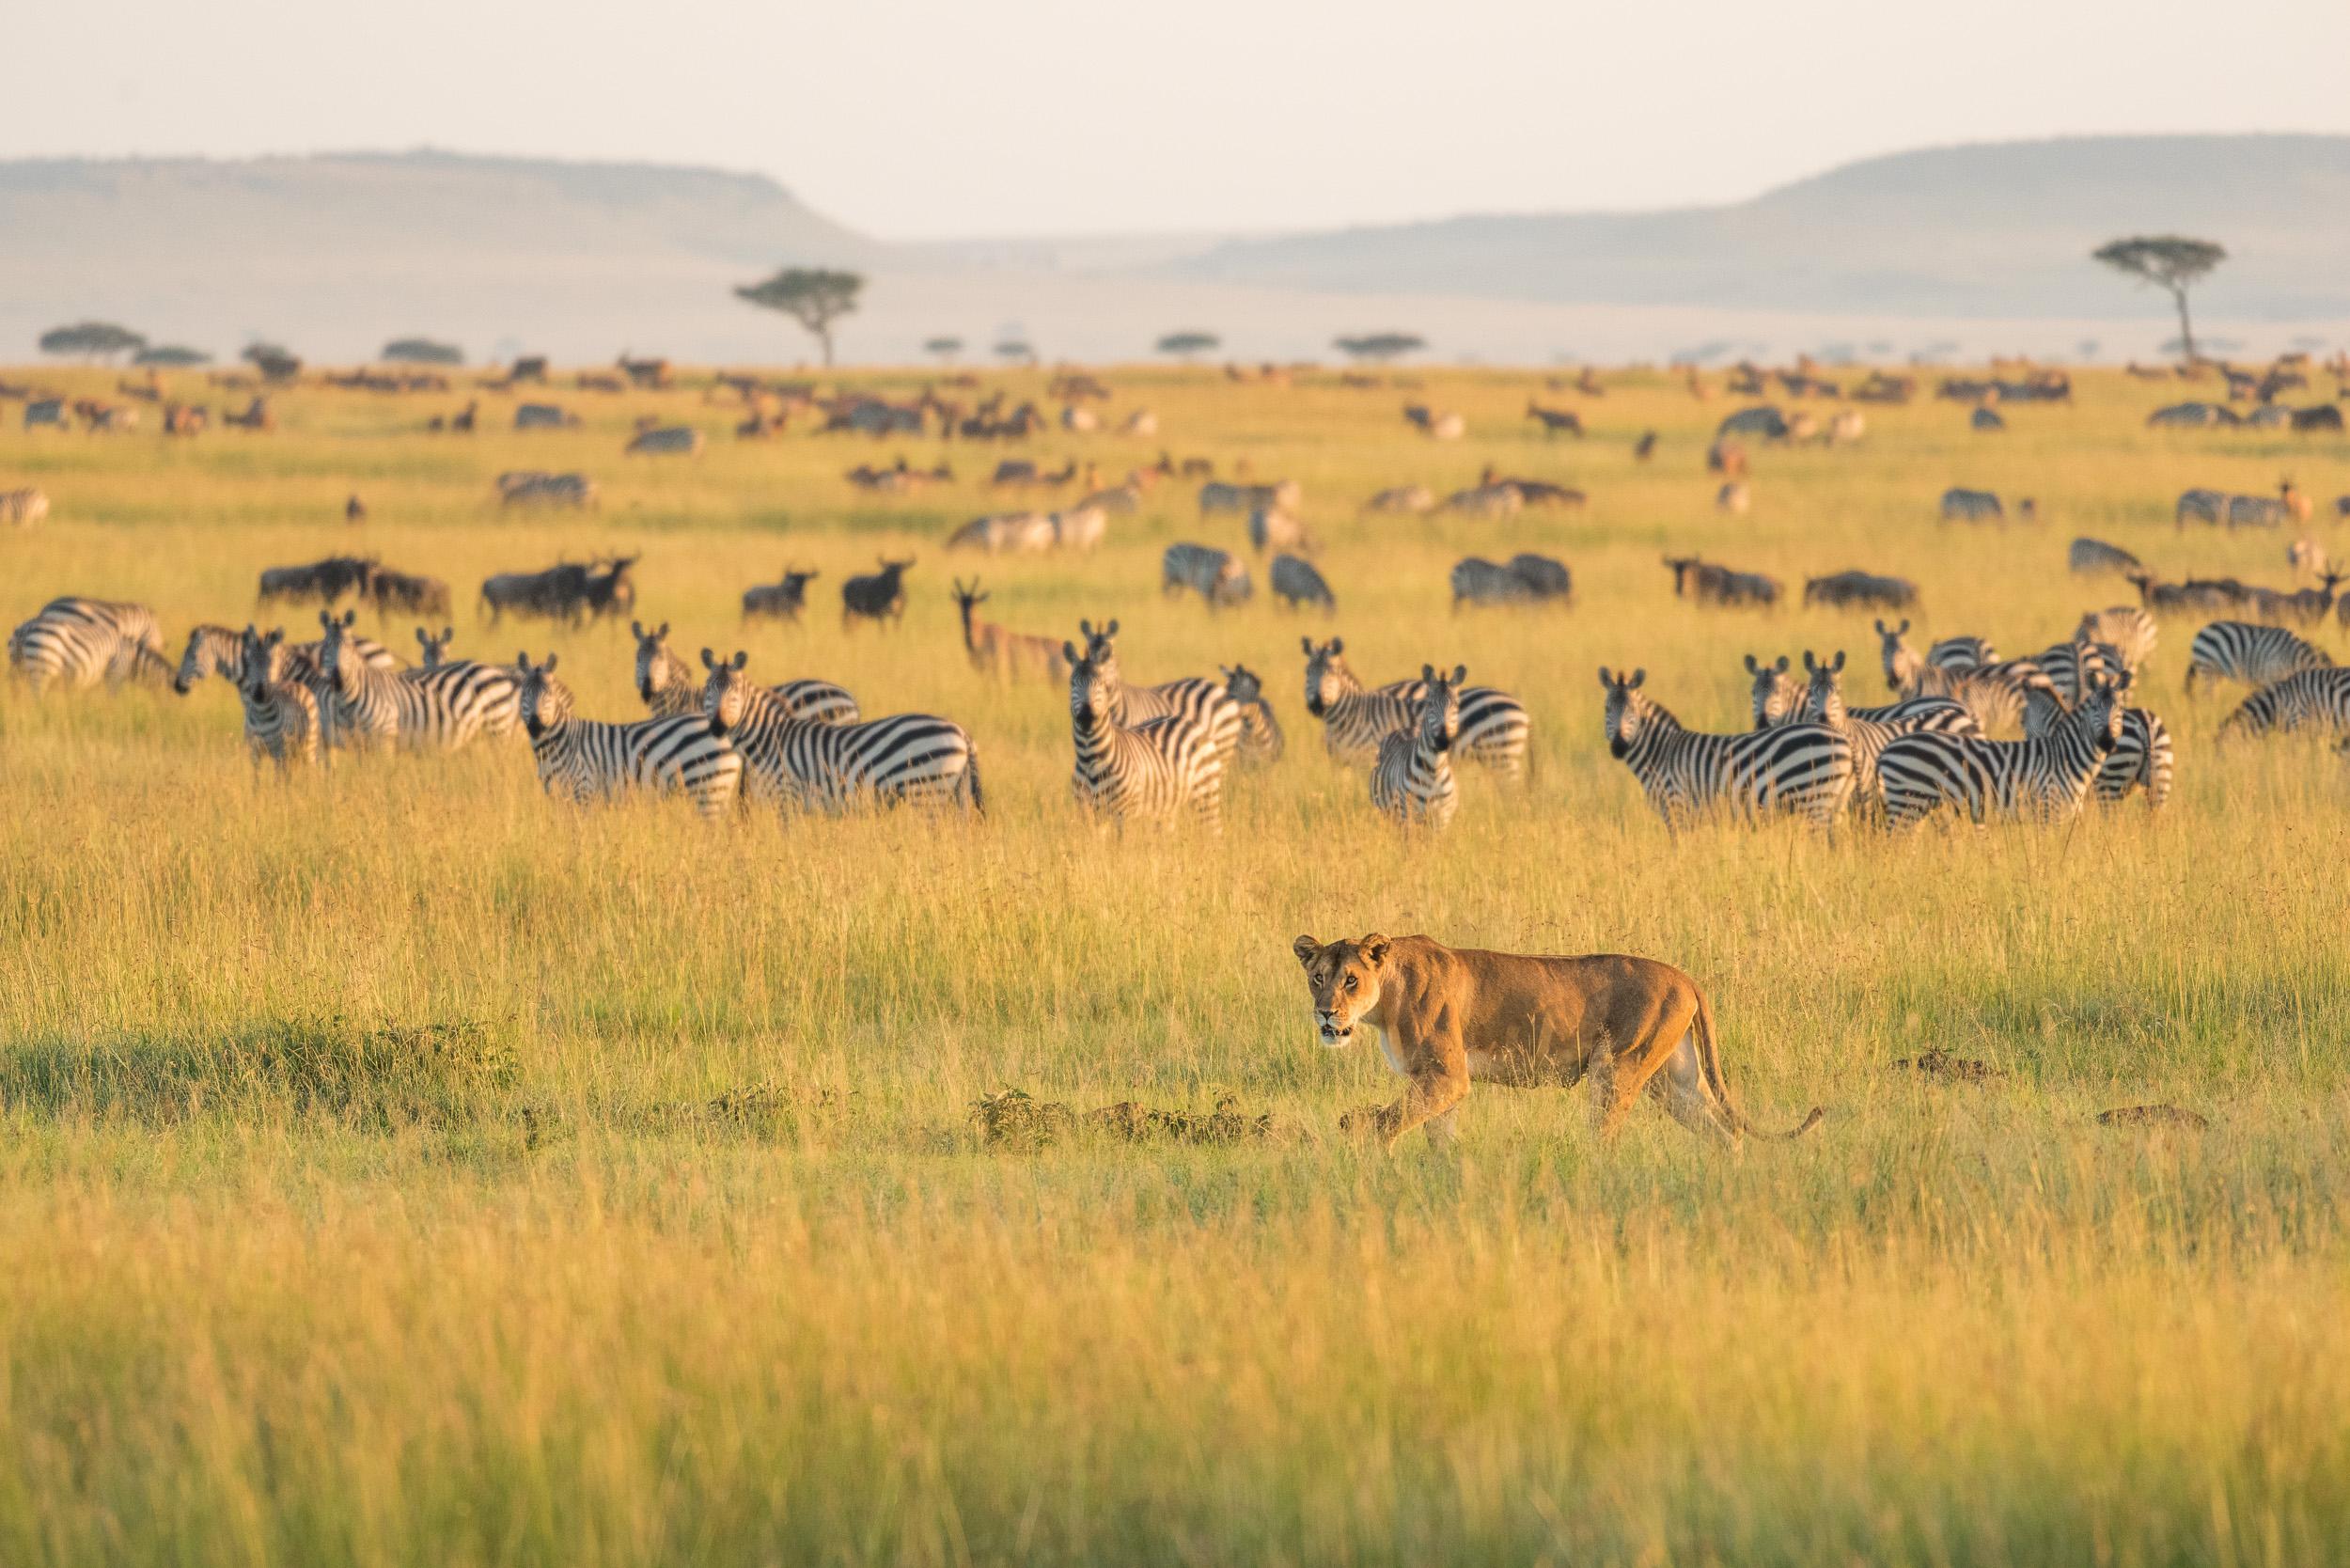 muench-workshops-tanzania-photo-safari (1).jpg